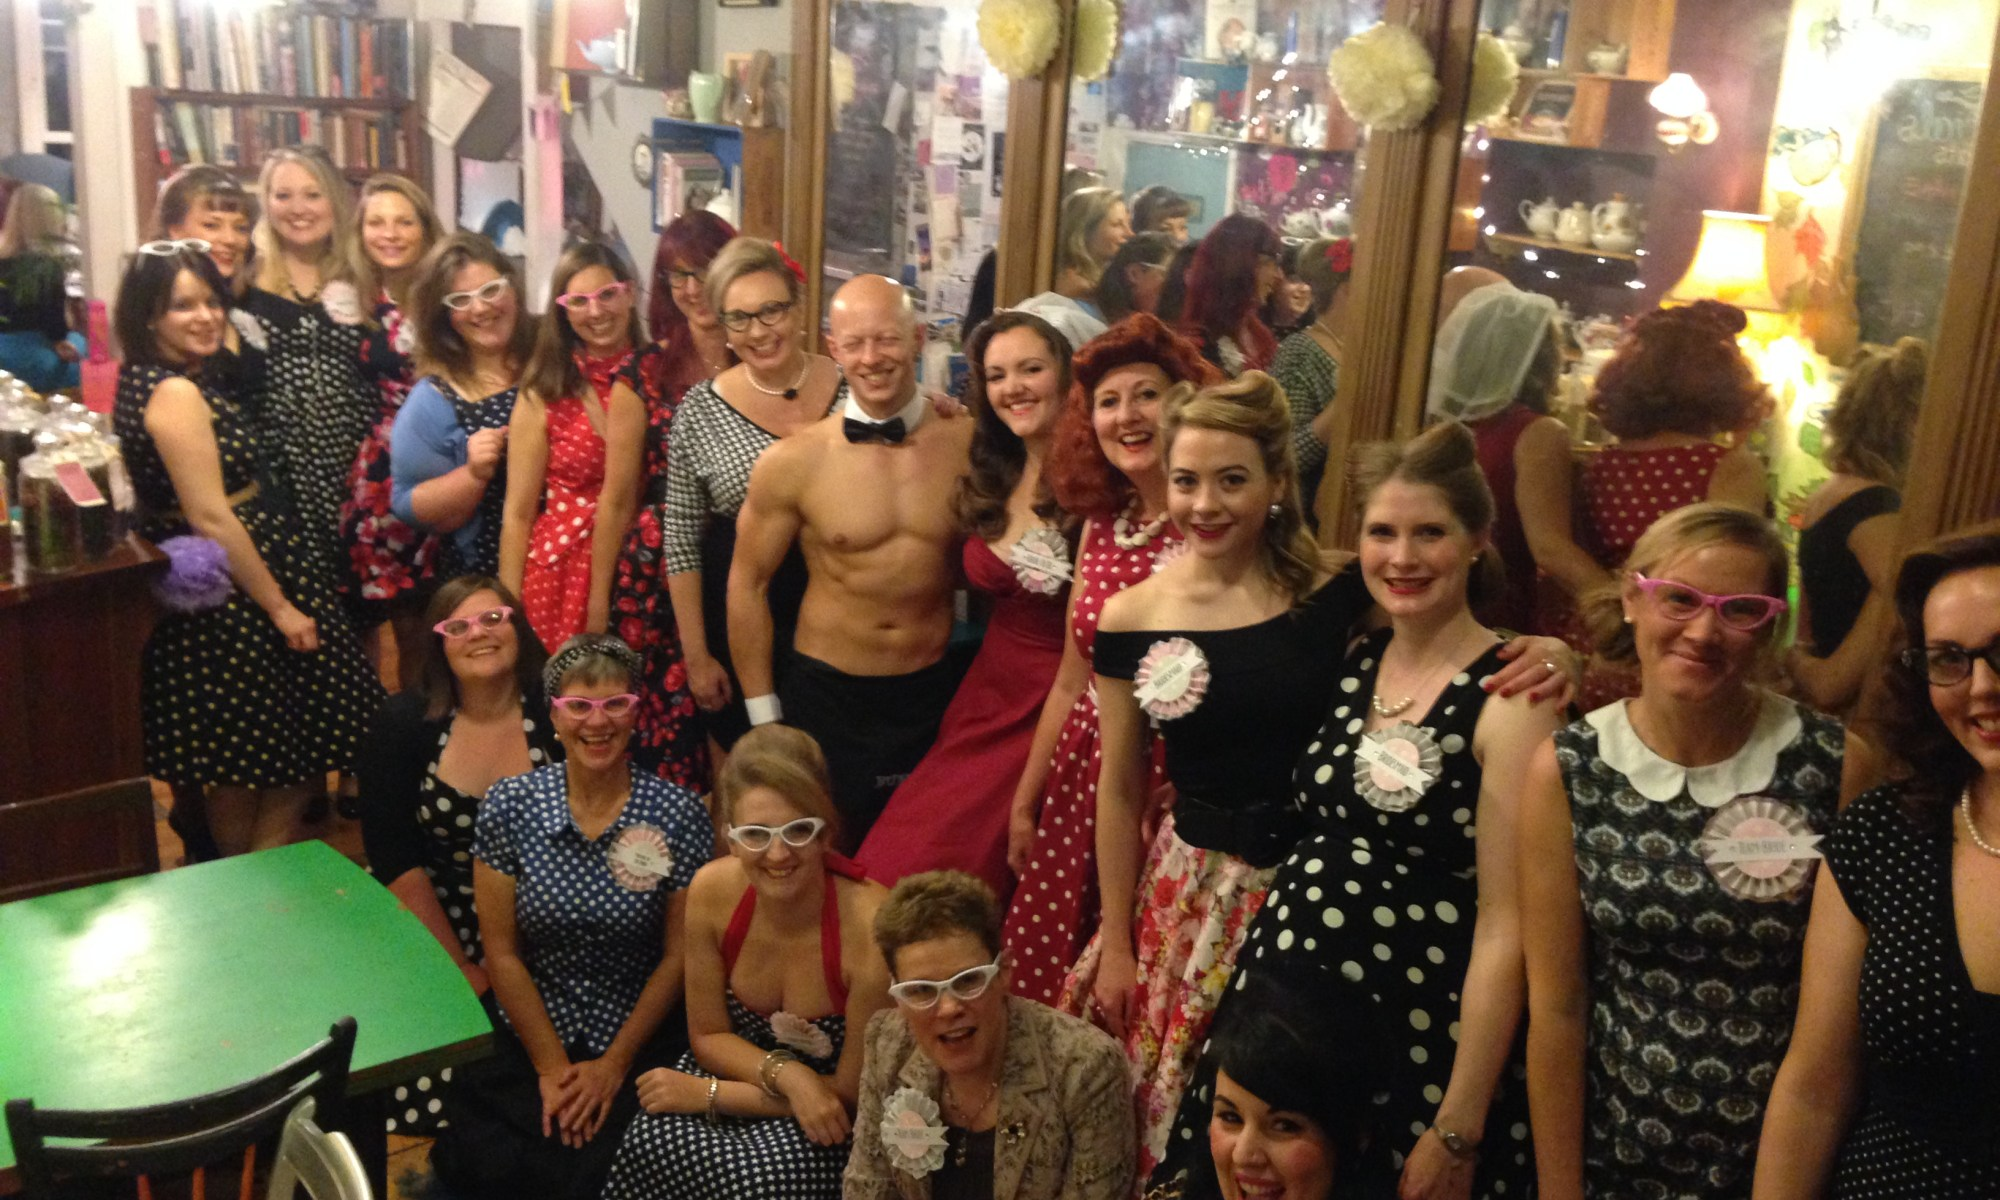 Hen Party Buff Butler - Bristol - Bath - 07747571426 benlowrey@me.com